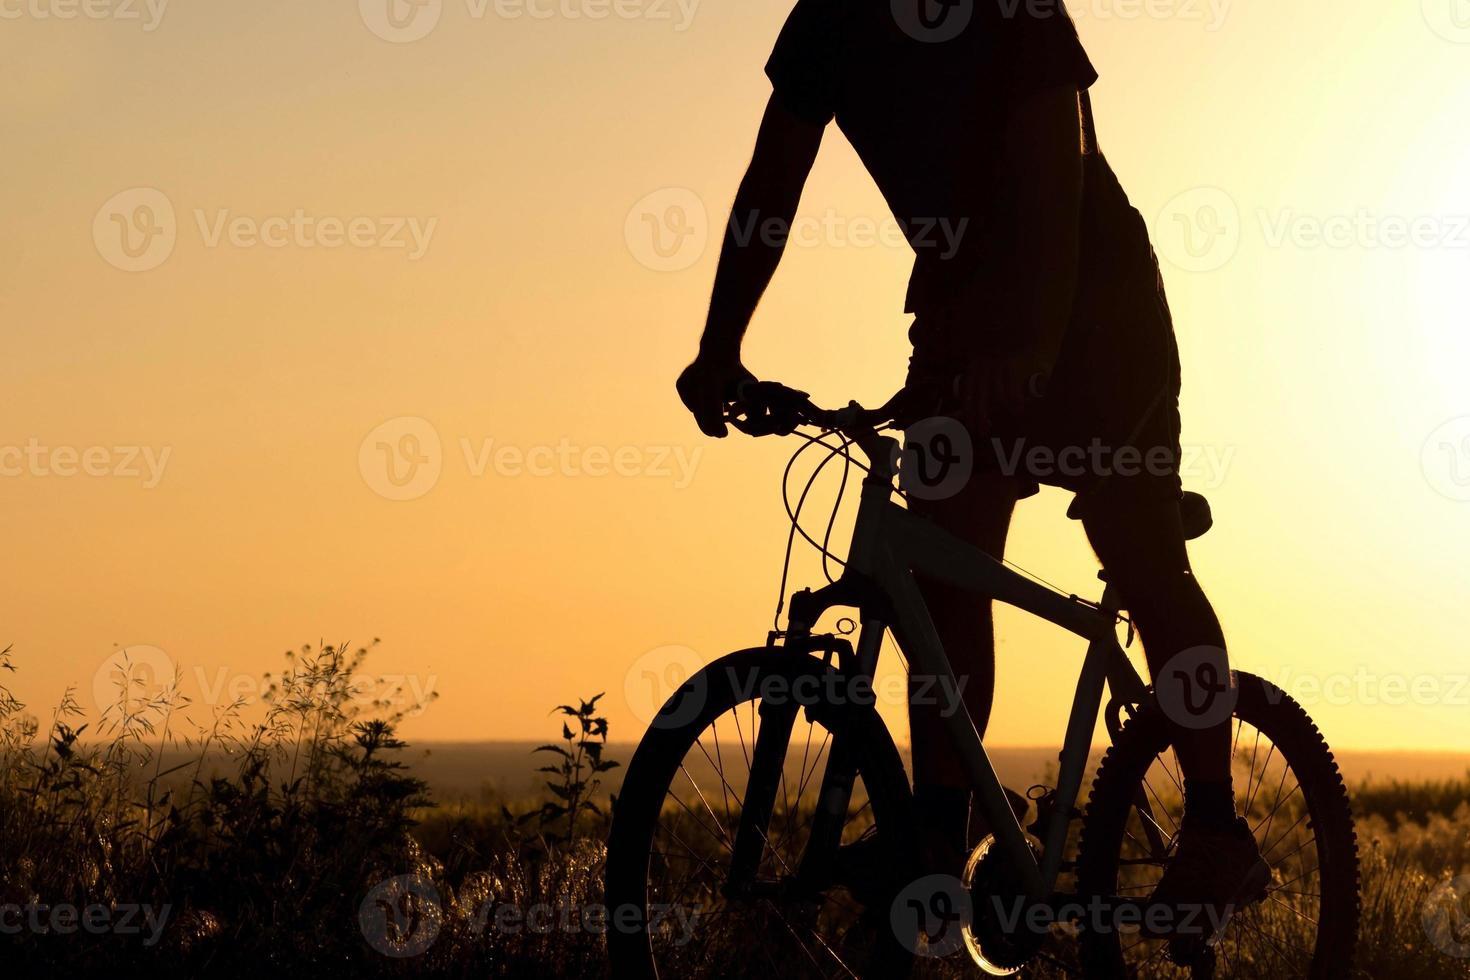 menino de bicicleta no campo foto